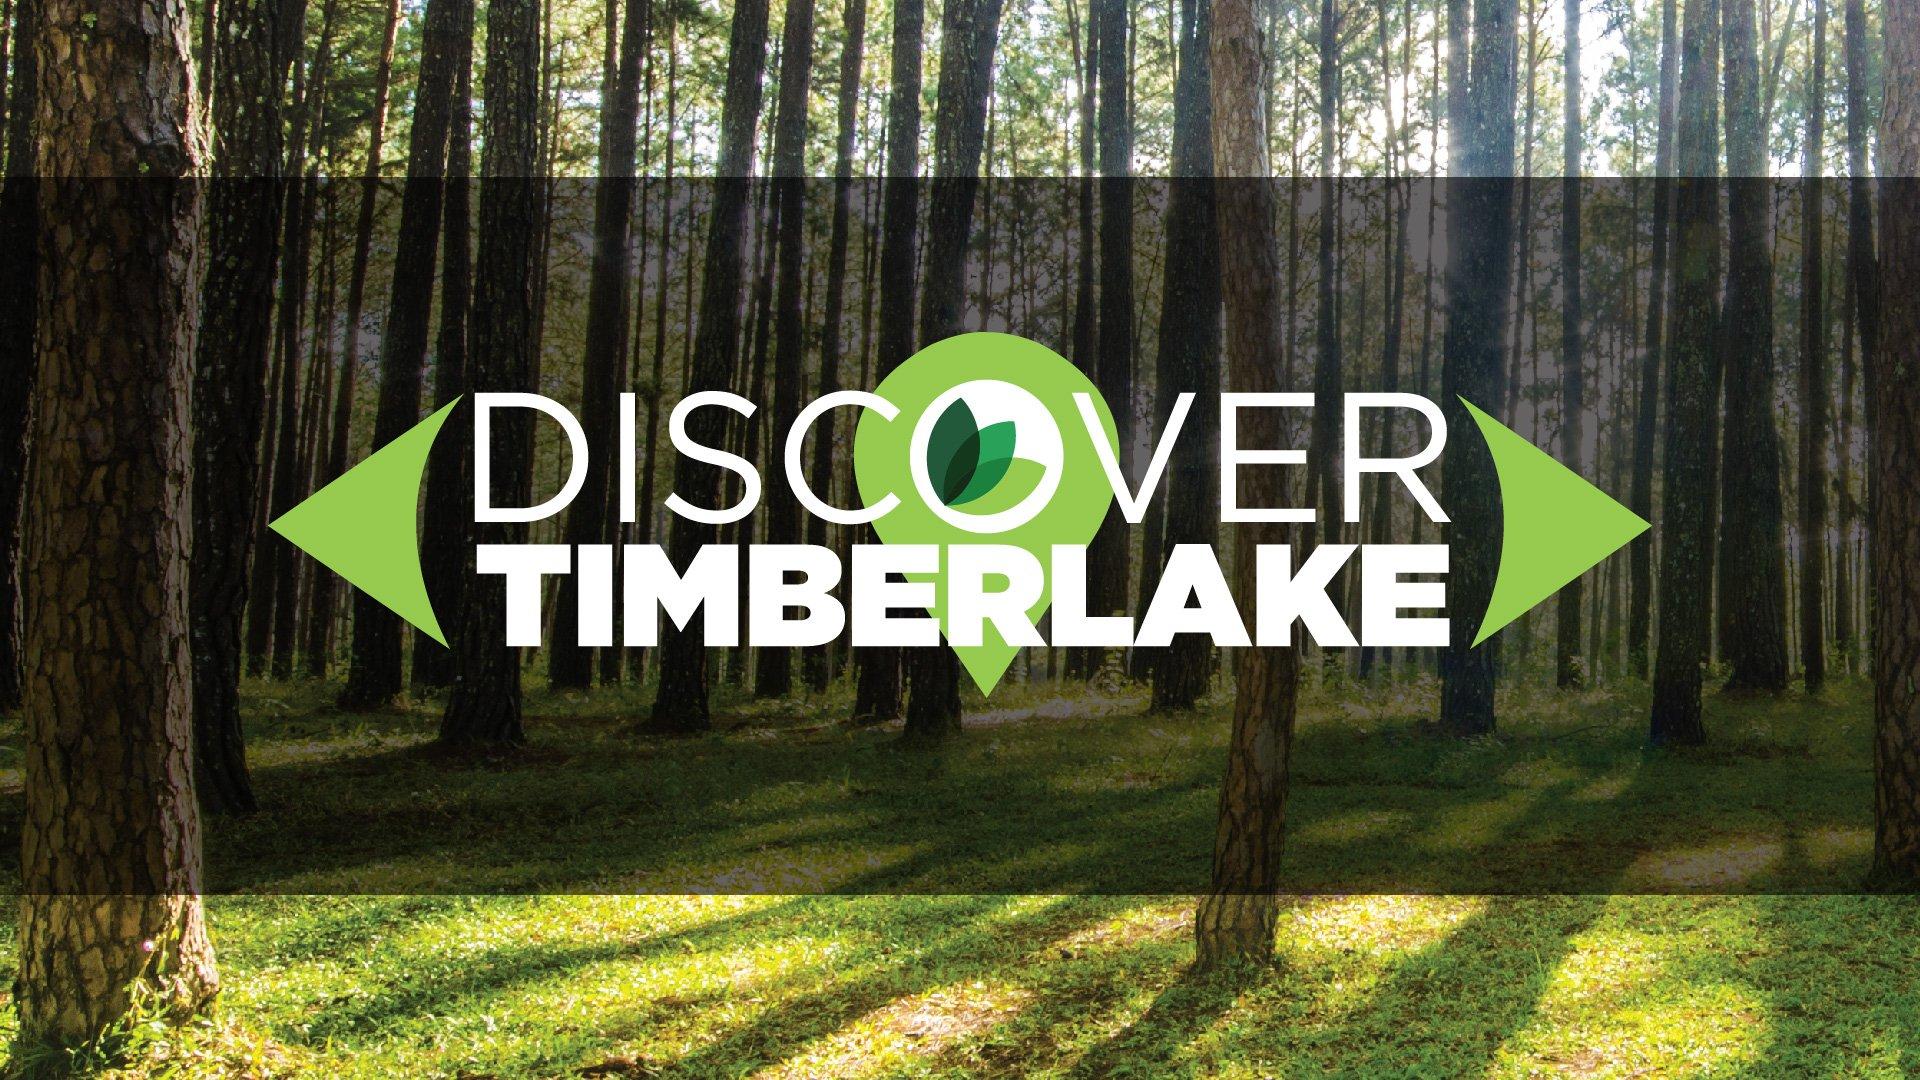 Discover Timberlake no info 1920x1080-01